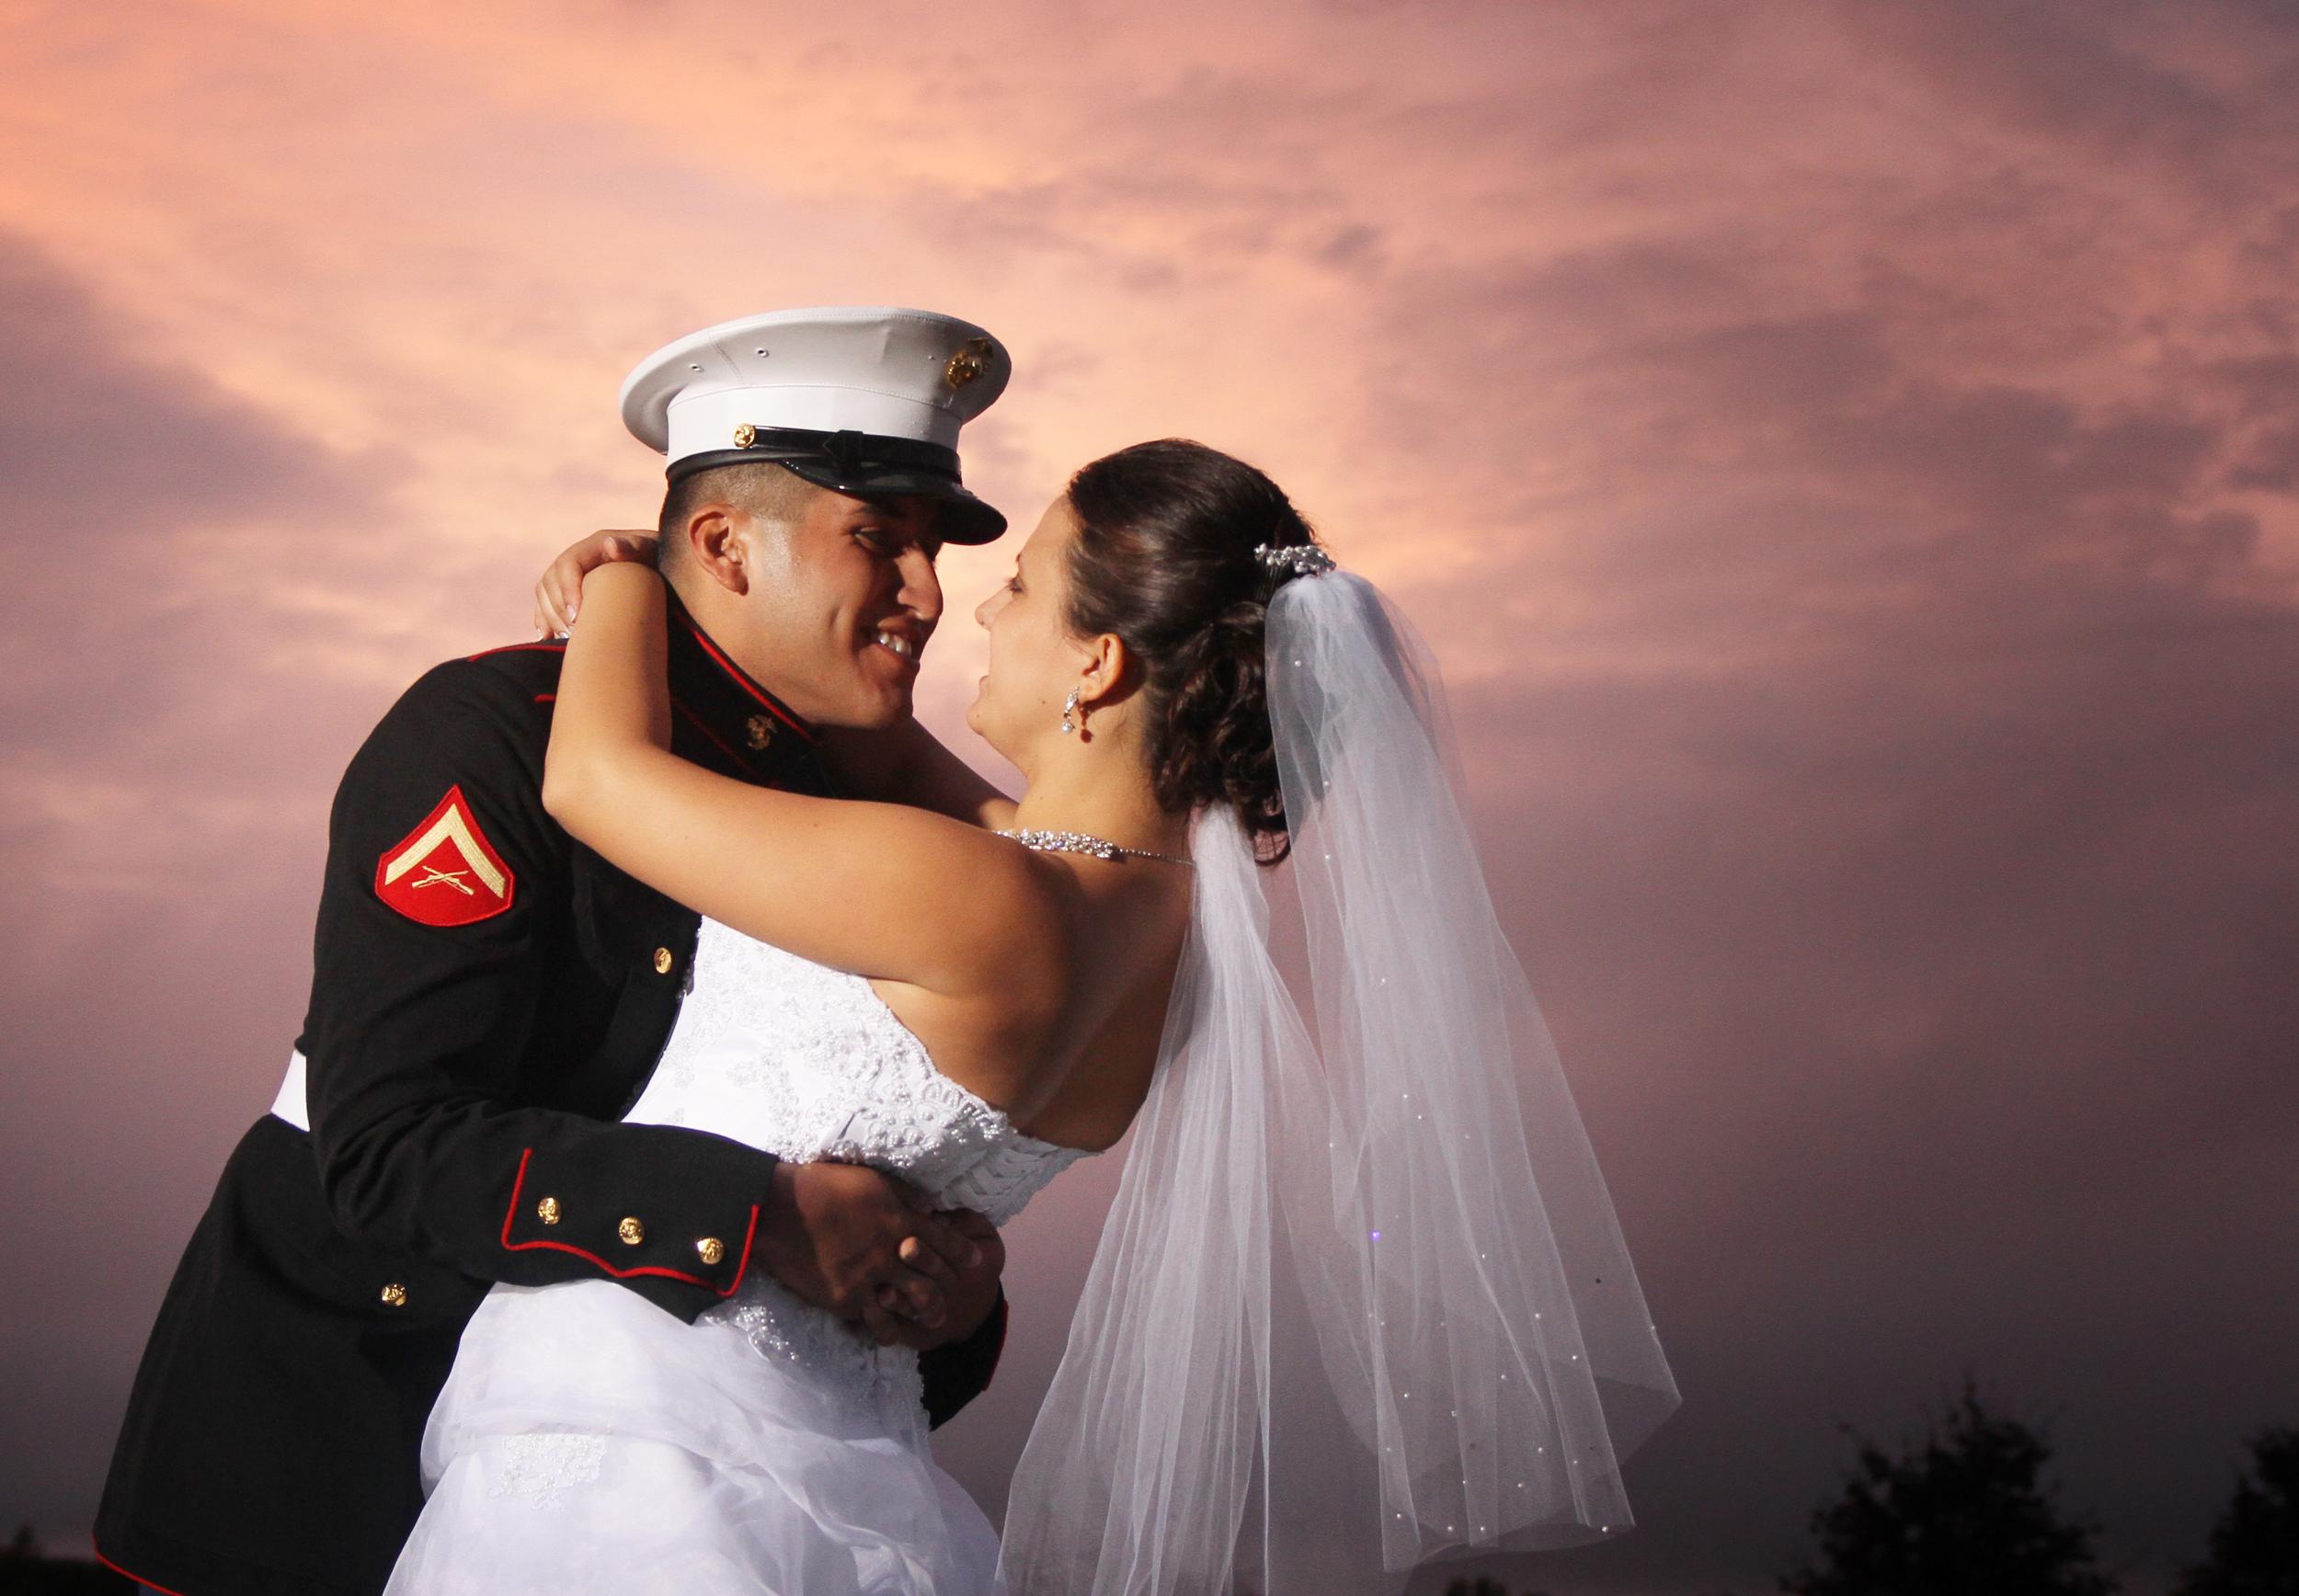 militarywedding1.jpg